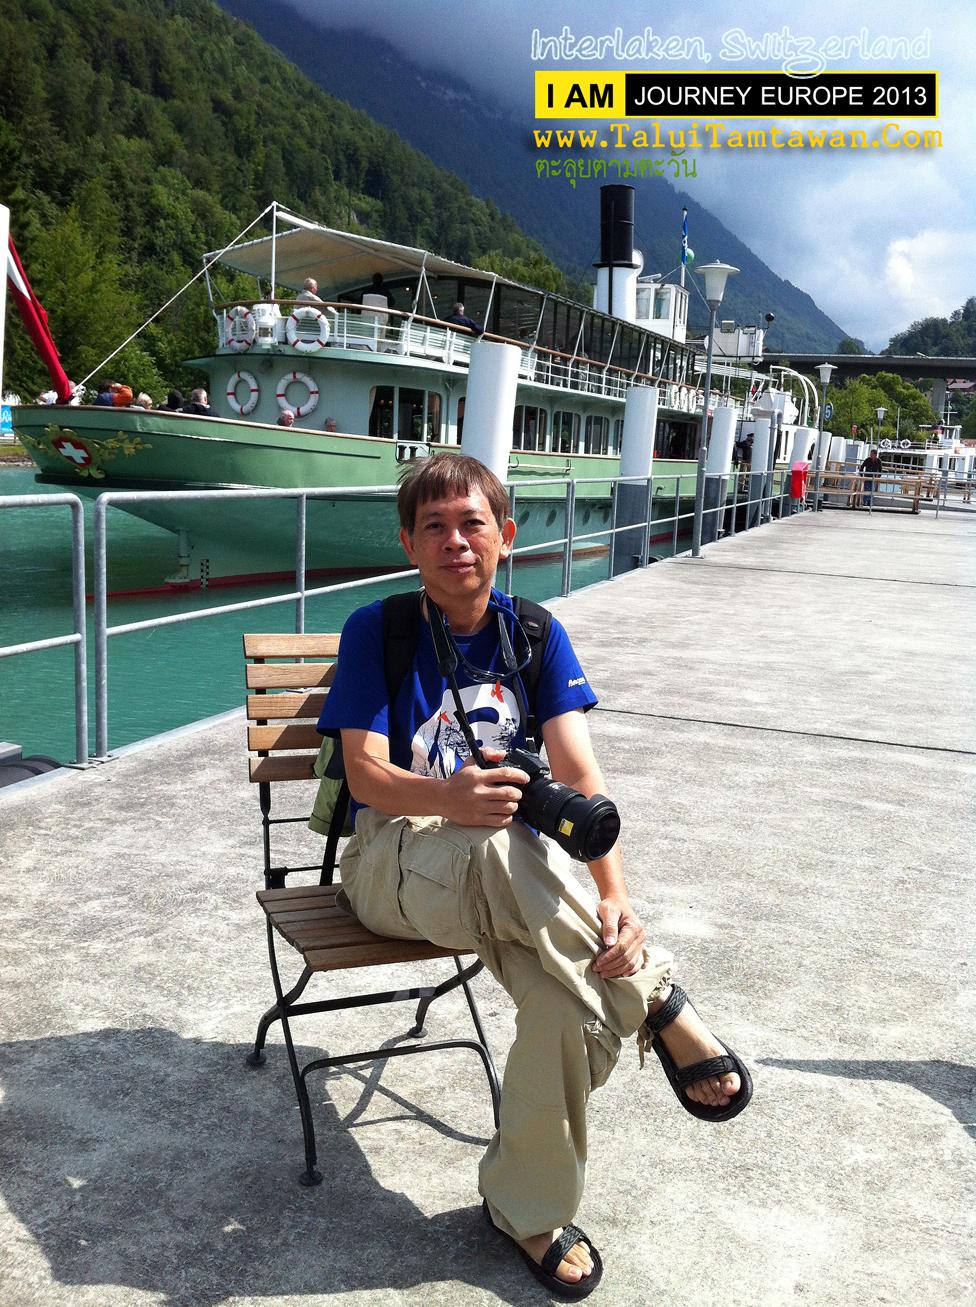 Interlaken Cruse To Brenz. นั่งเรือชมวิว ในทะเลสาบ